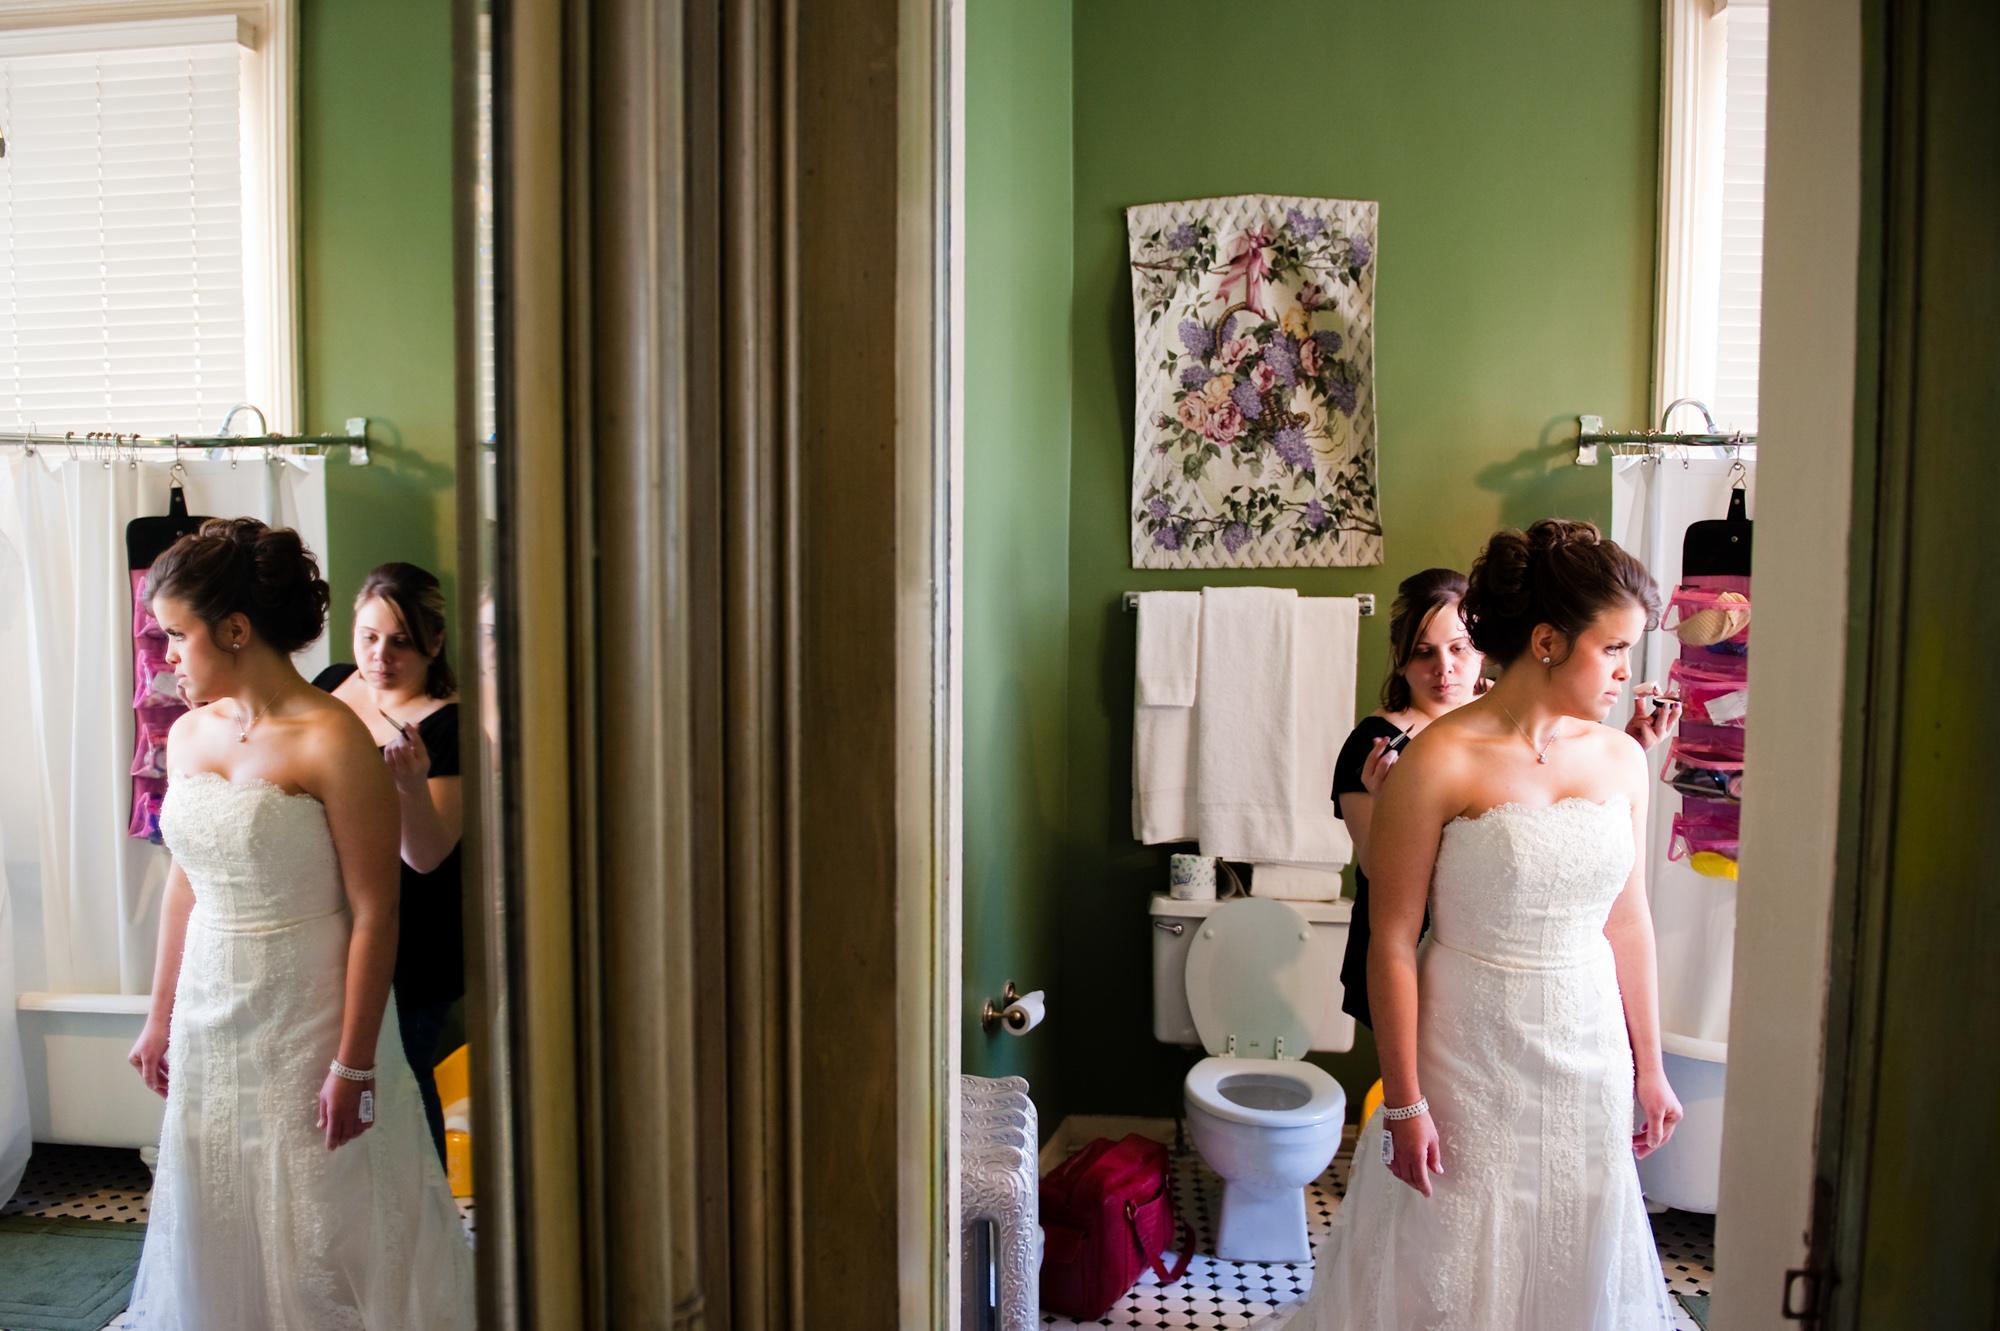 Scott-Myers-Photography-WeddingScott-Myers-Photography-Wedding_SAM6284.jpg